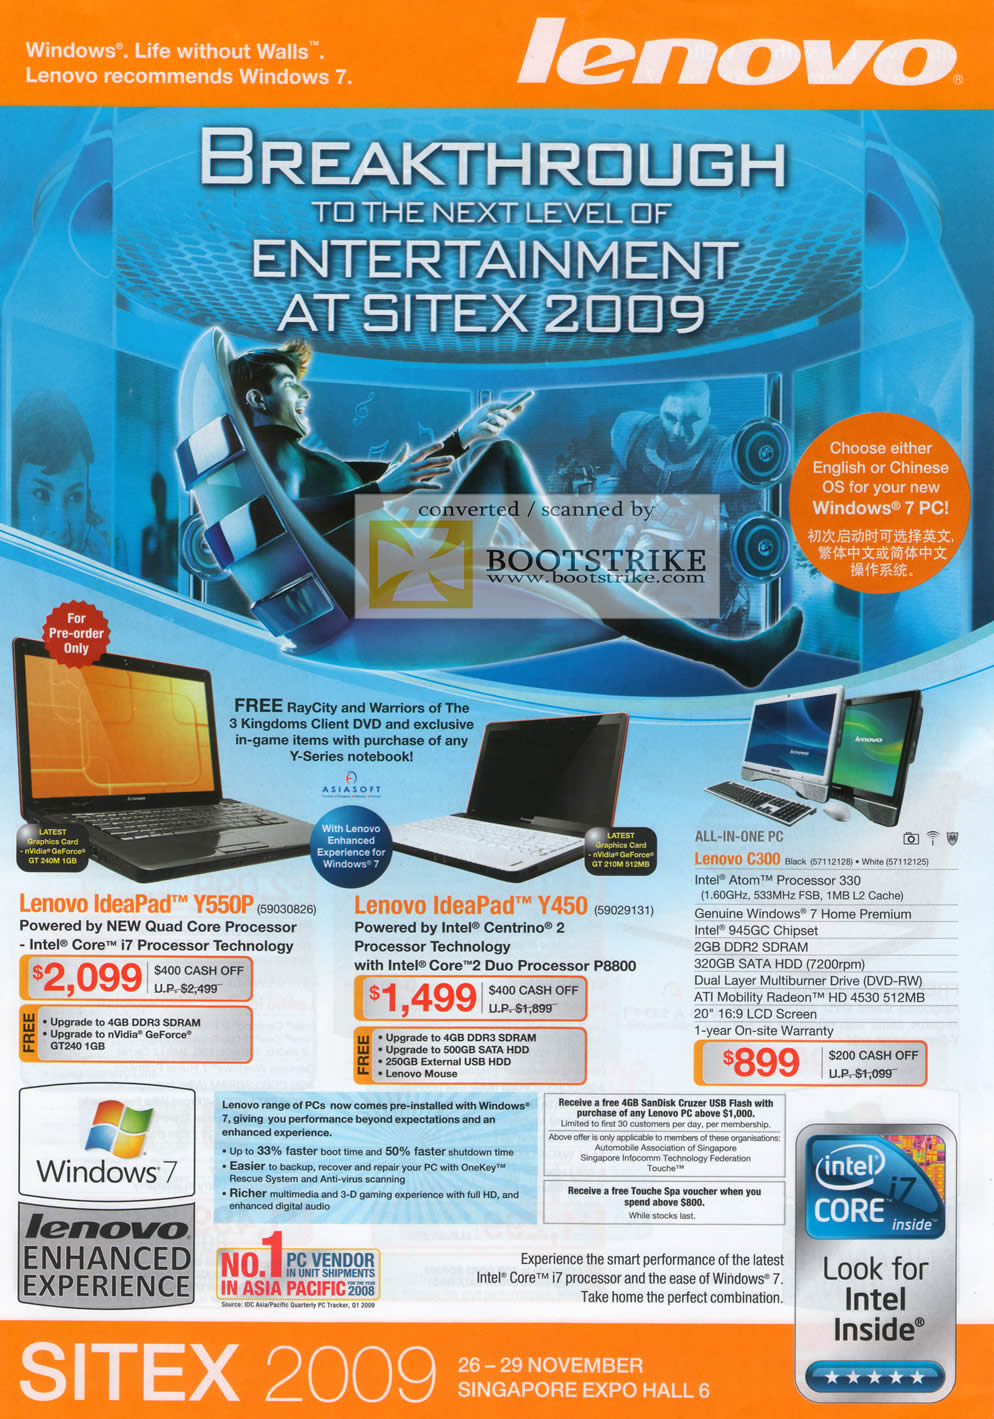 Sitex 2009 price list image brochure of Lenovo IdeaPad Notebooks Y550P Y450 C300 Desktop PC